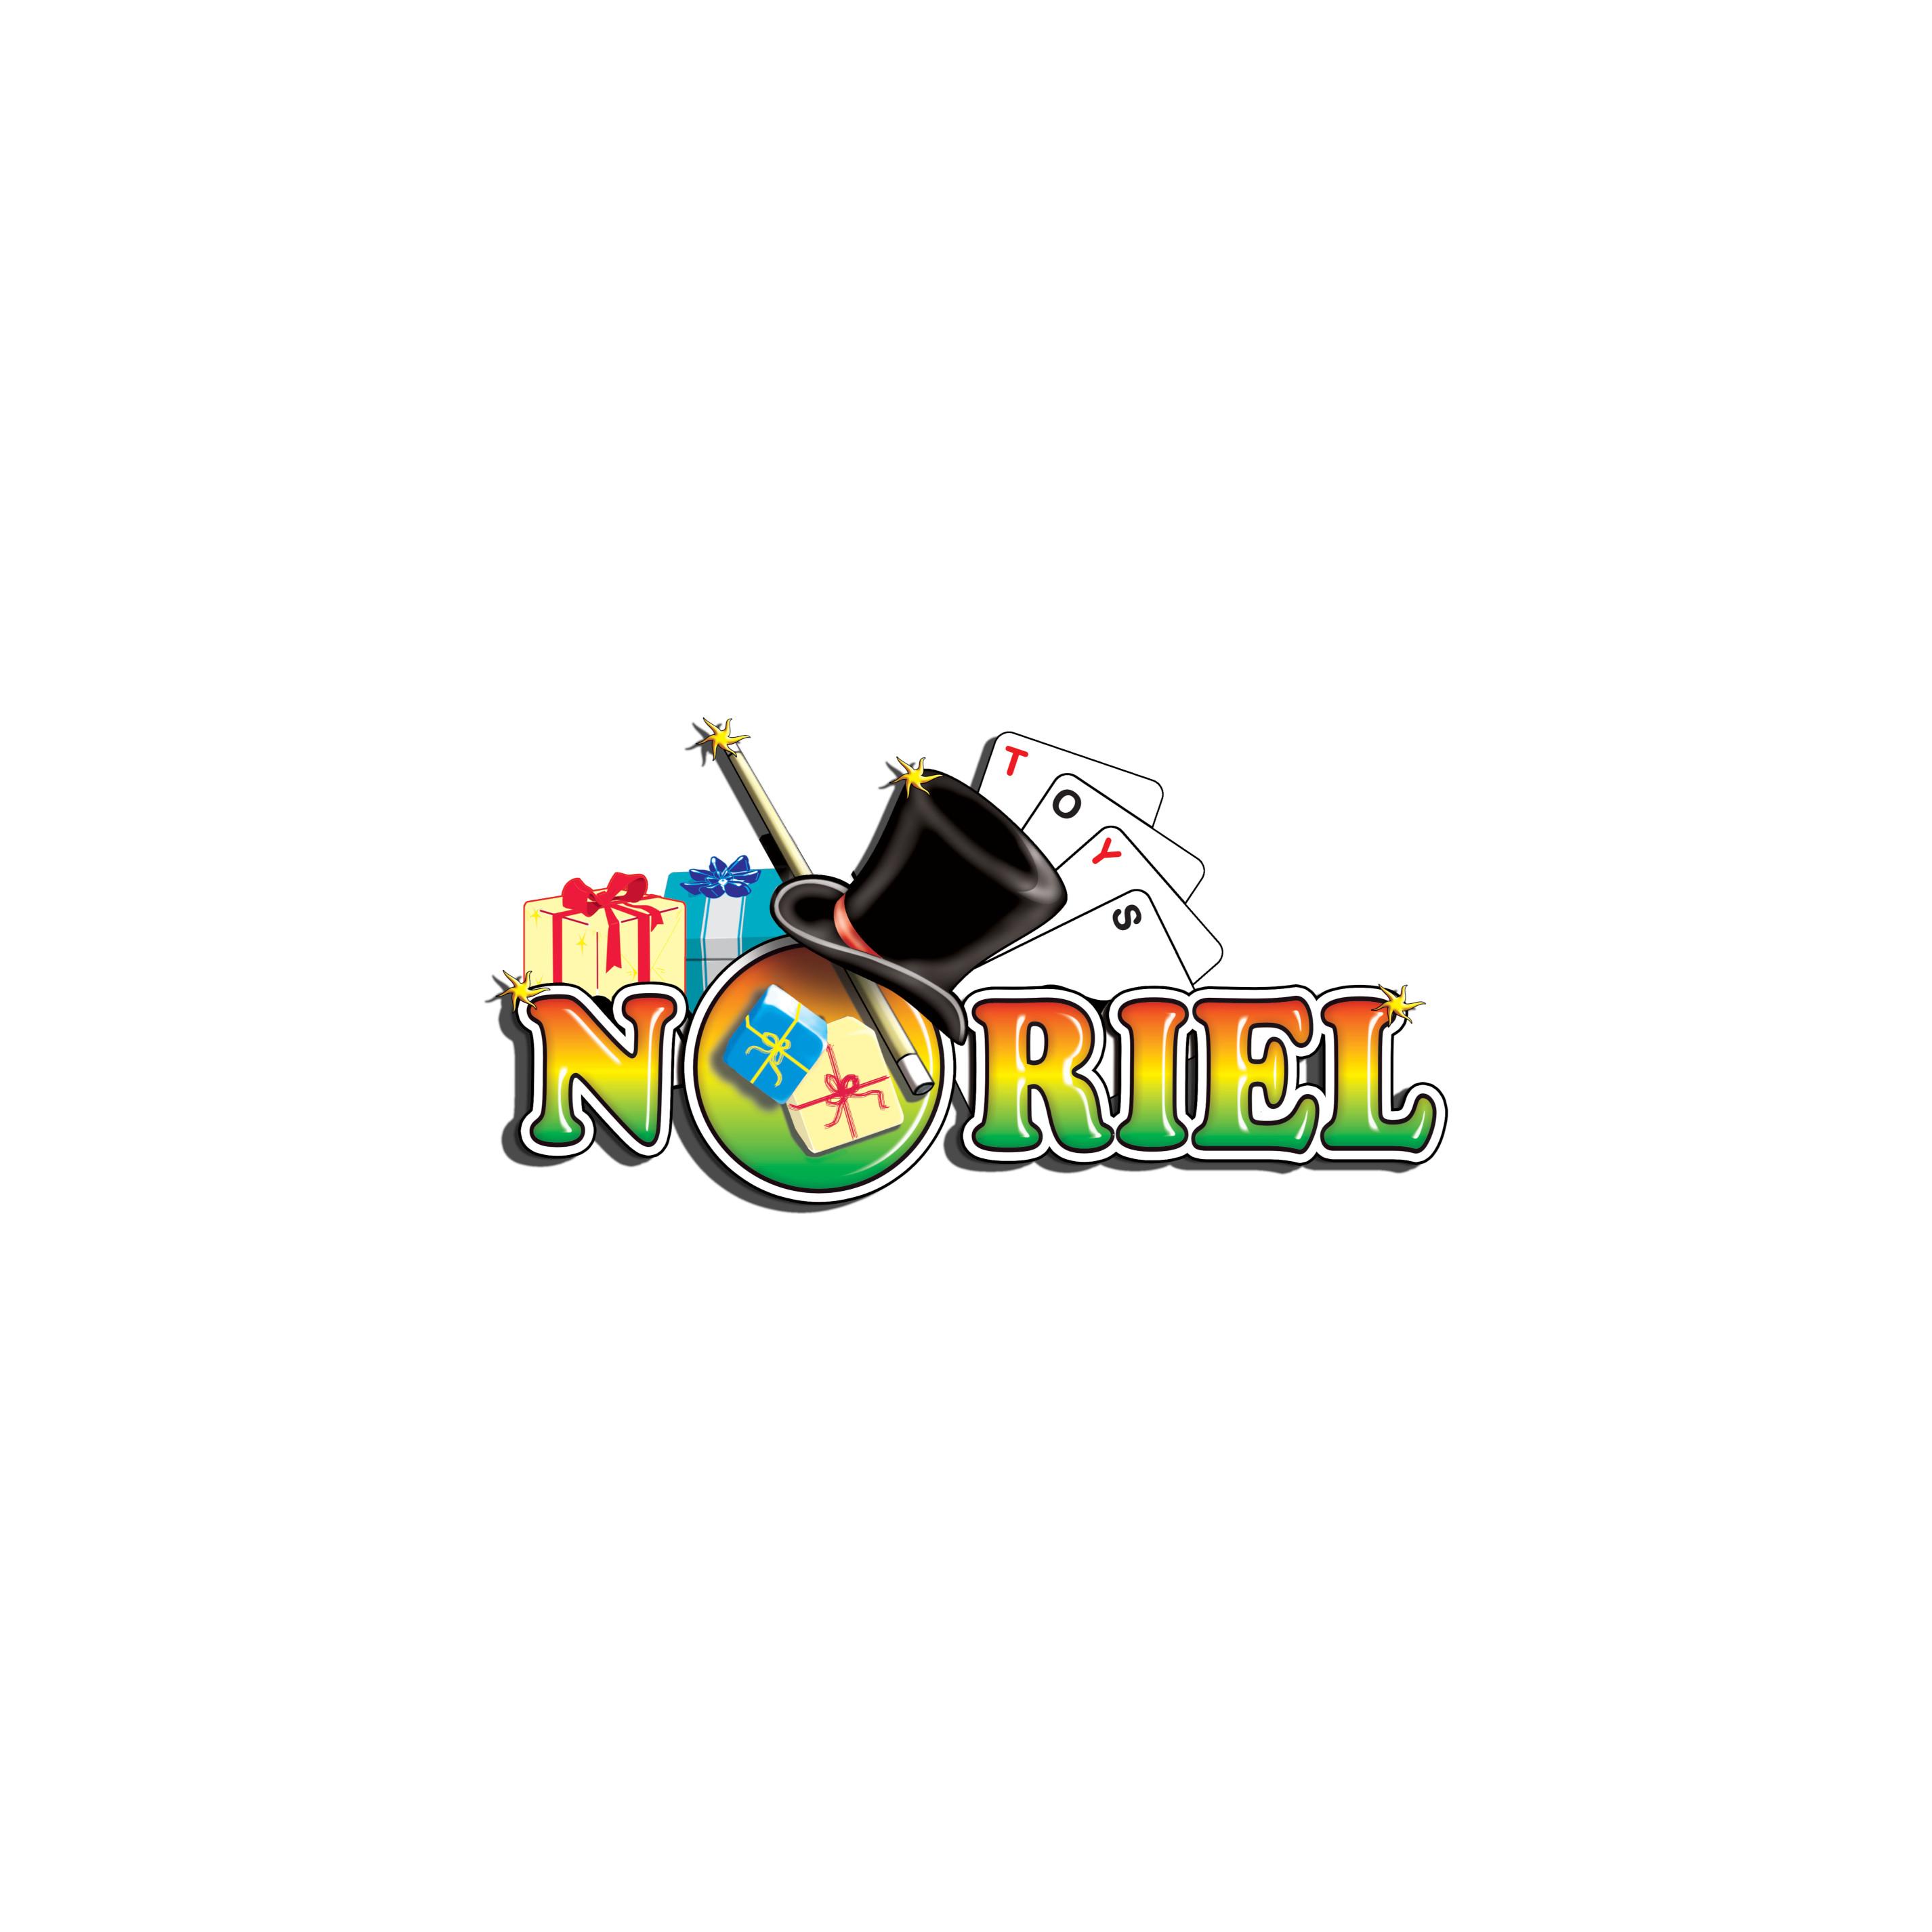 LEGO® Ninjago - Vehiculele lui Kai si Zane - Motociclete Blade si snowmobilul (70667)